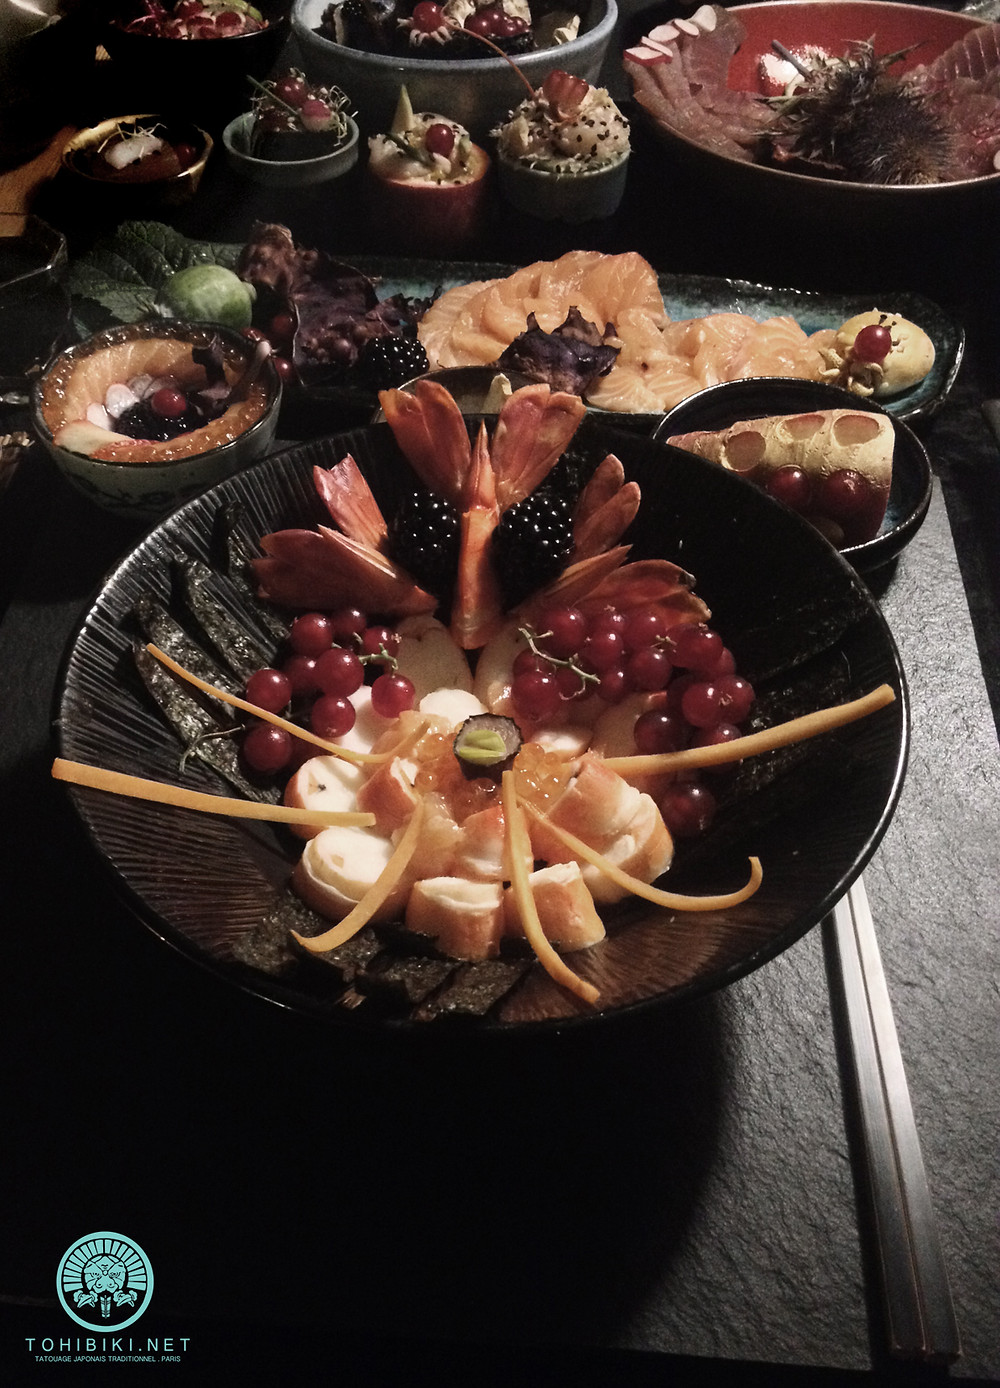 Kaiseki 会席, kaiseki-ryōri 会席料理 . La « pierre dans la poitrine » selon les kanji de Sen no Rikyū (1522-1591). Tatouage japonais Paris, Acquigny, France. Irezumi, Tebori.